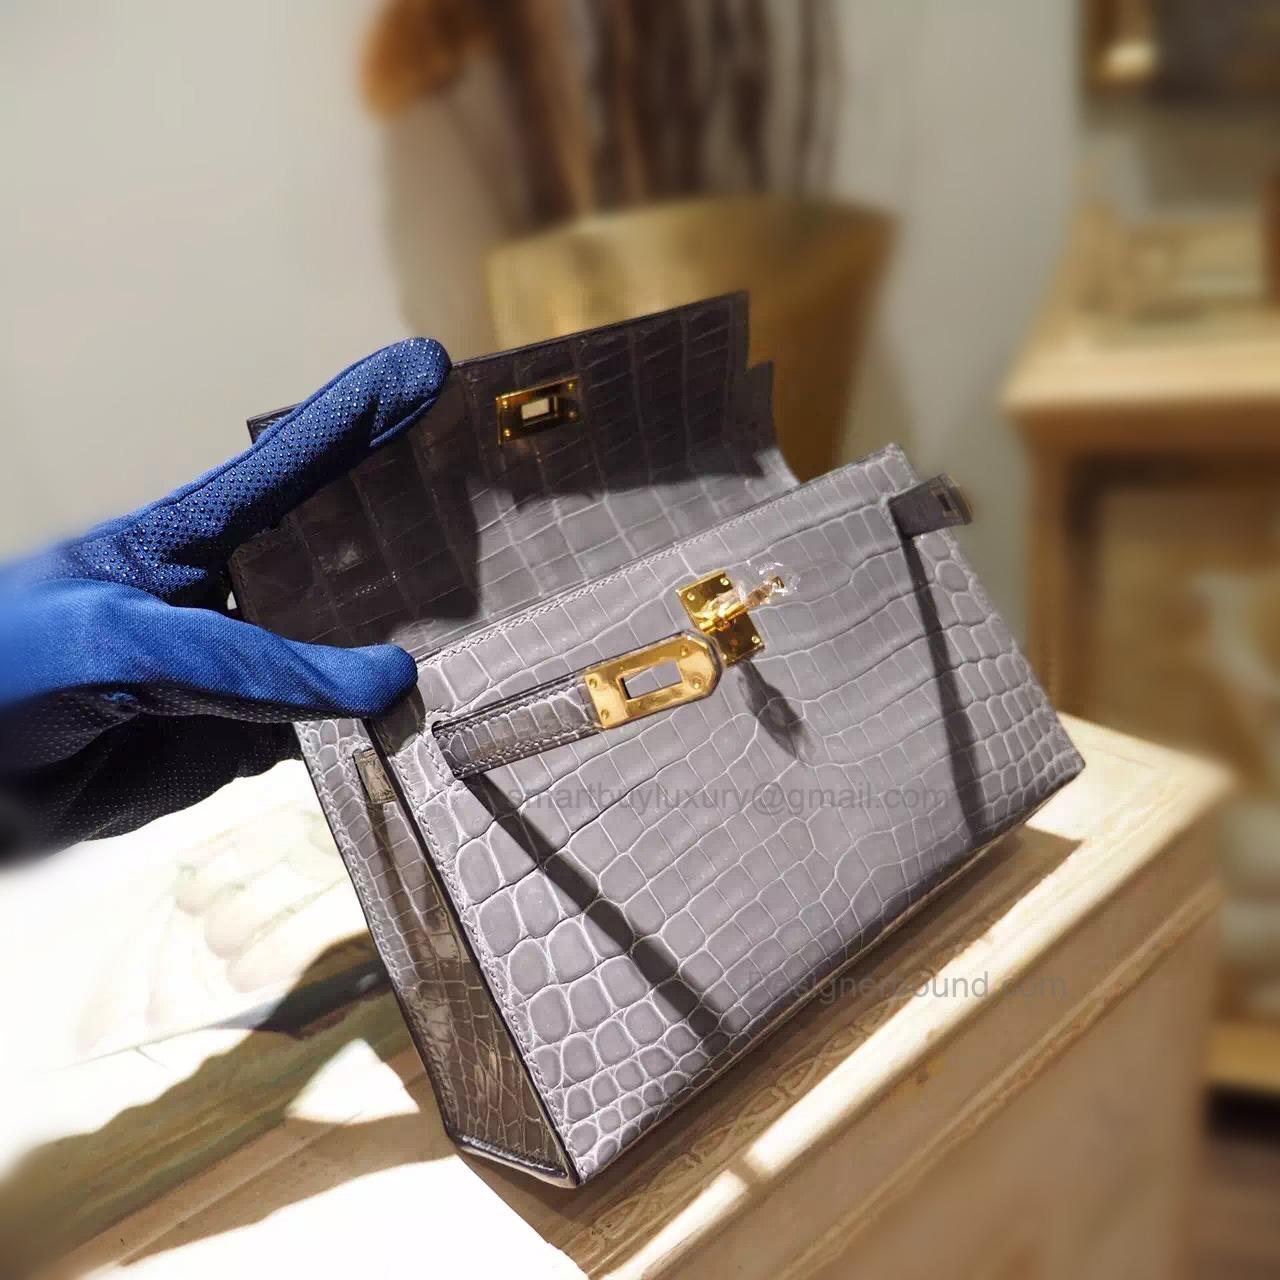 523b5a4e137e ... top quality hermes mini kelly 22 pochette bag in ck81 gris tourterelle  shining nile croc ghw